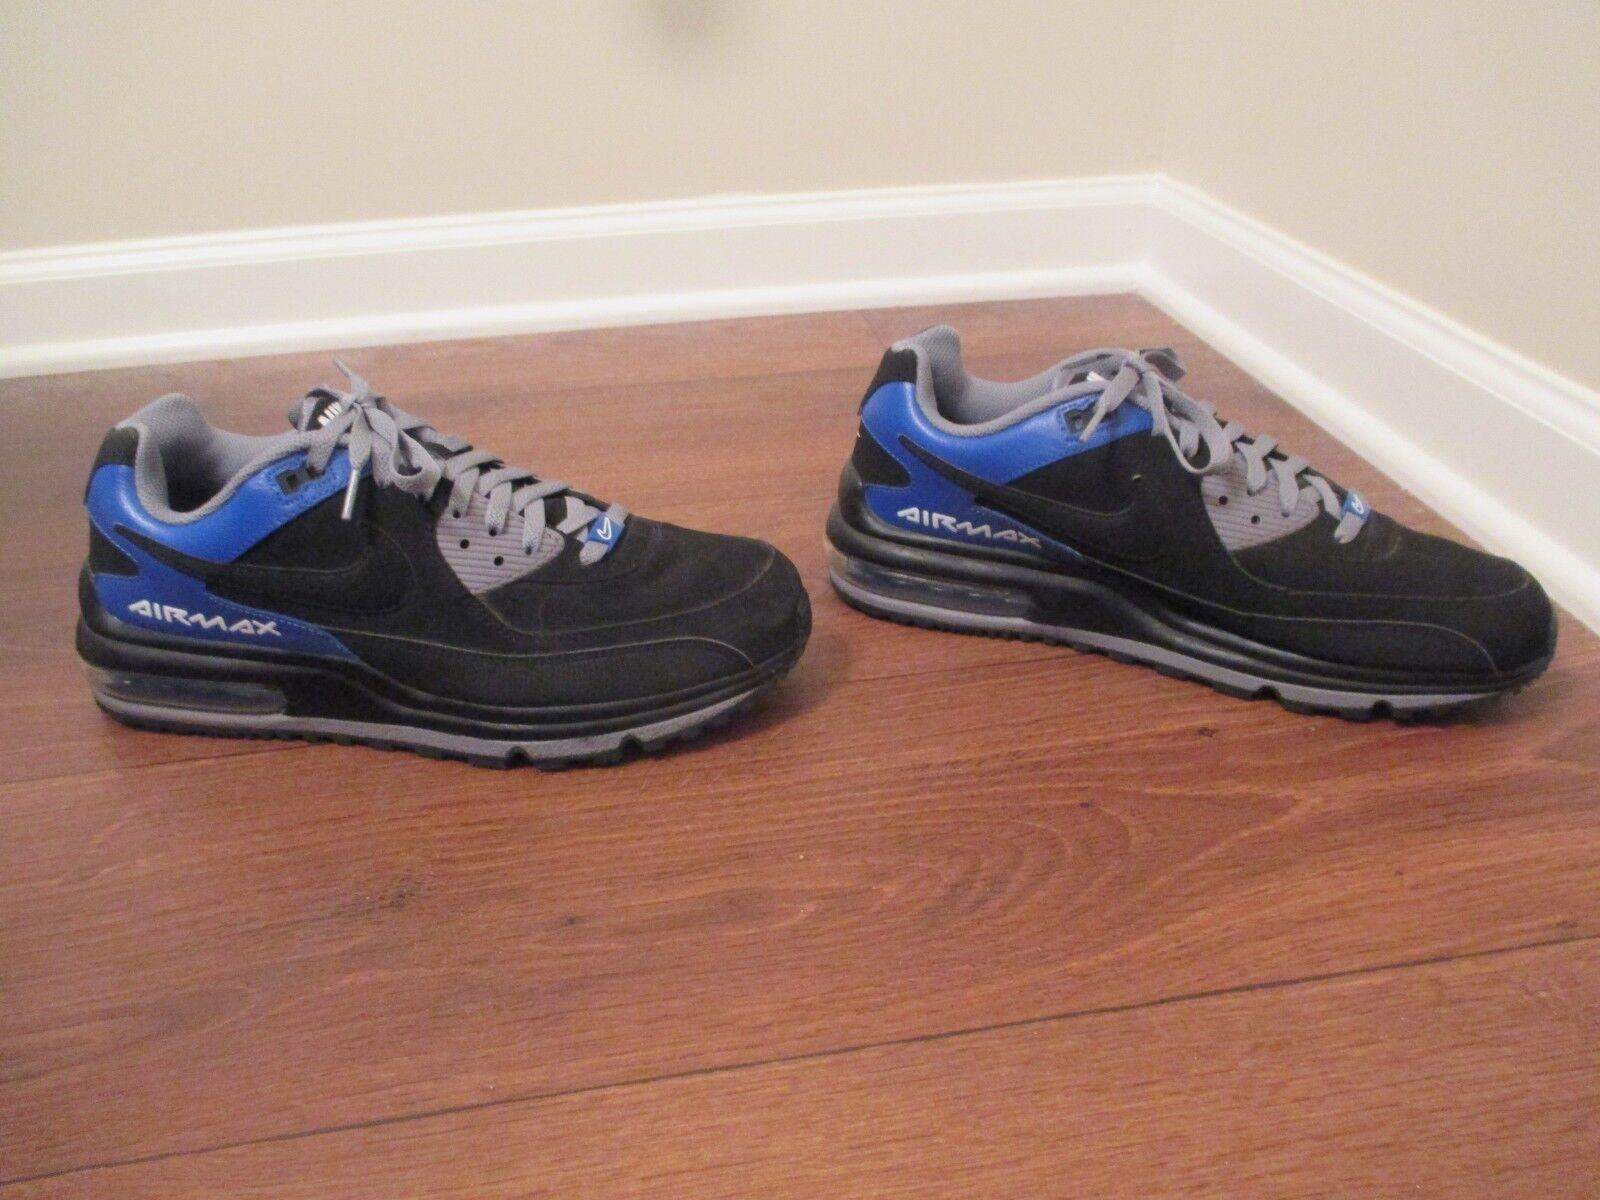 Nike air max 95 ragazzi dimensioni 905461 (1y) orange neon 97 98 jordan 1 xi 905461 dimensioni 008 859575